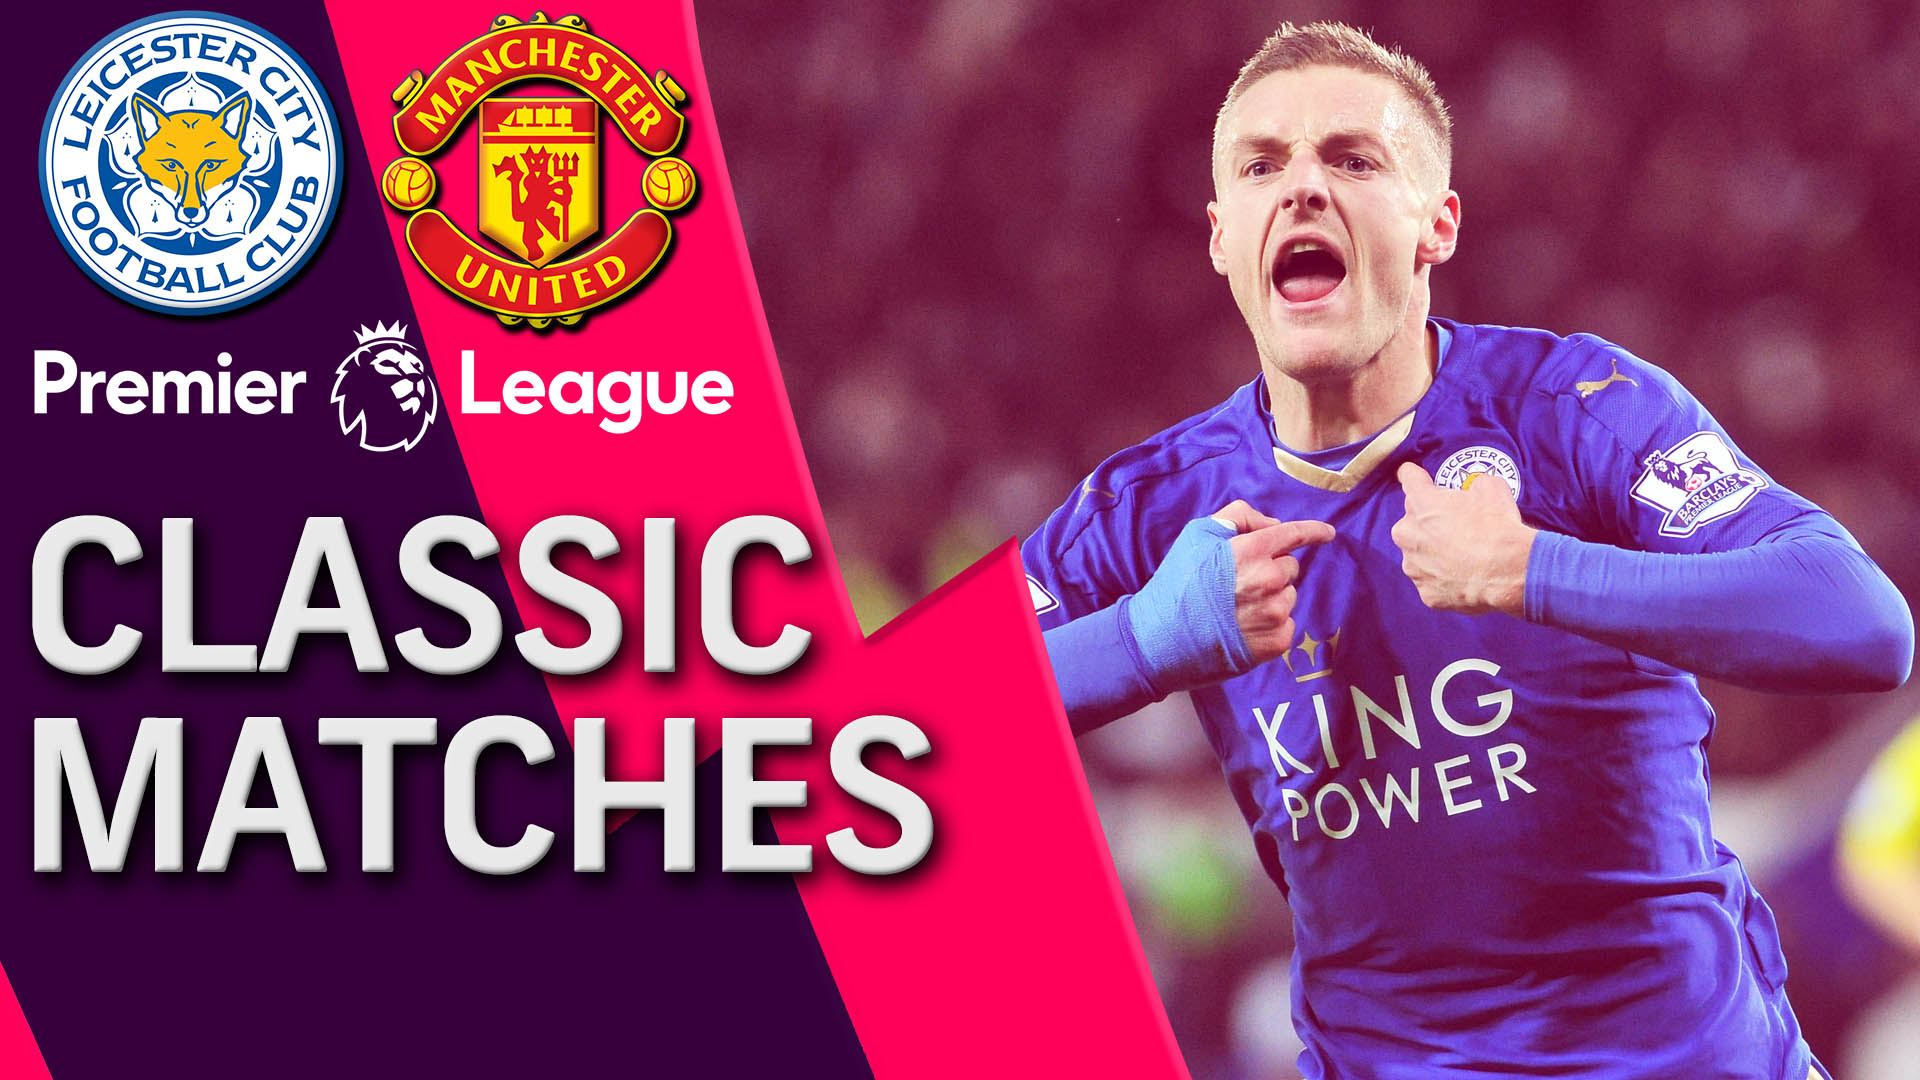 Premier League classic match: Leicester City v. Manchester United